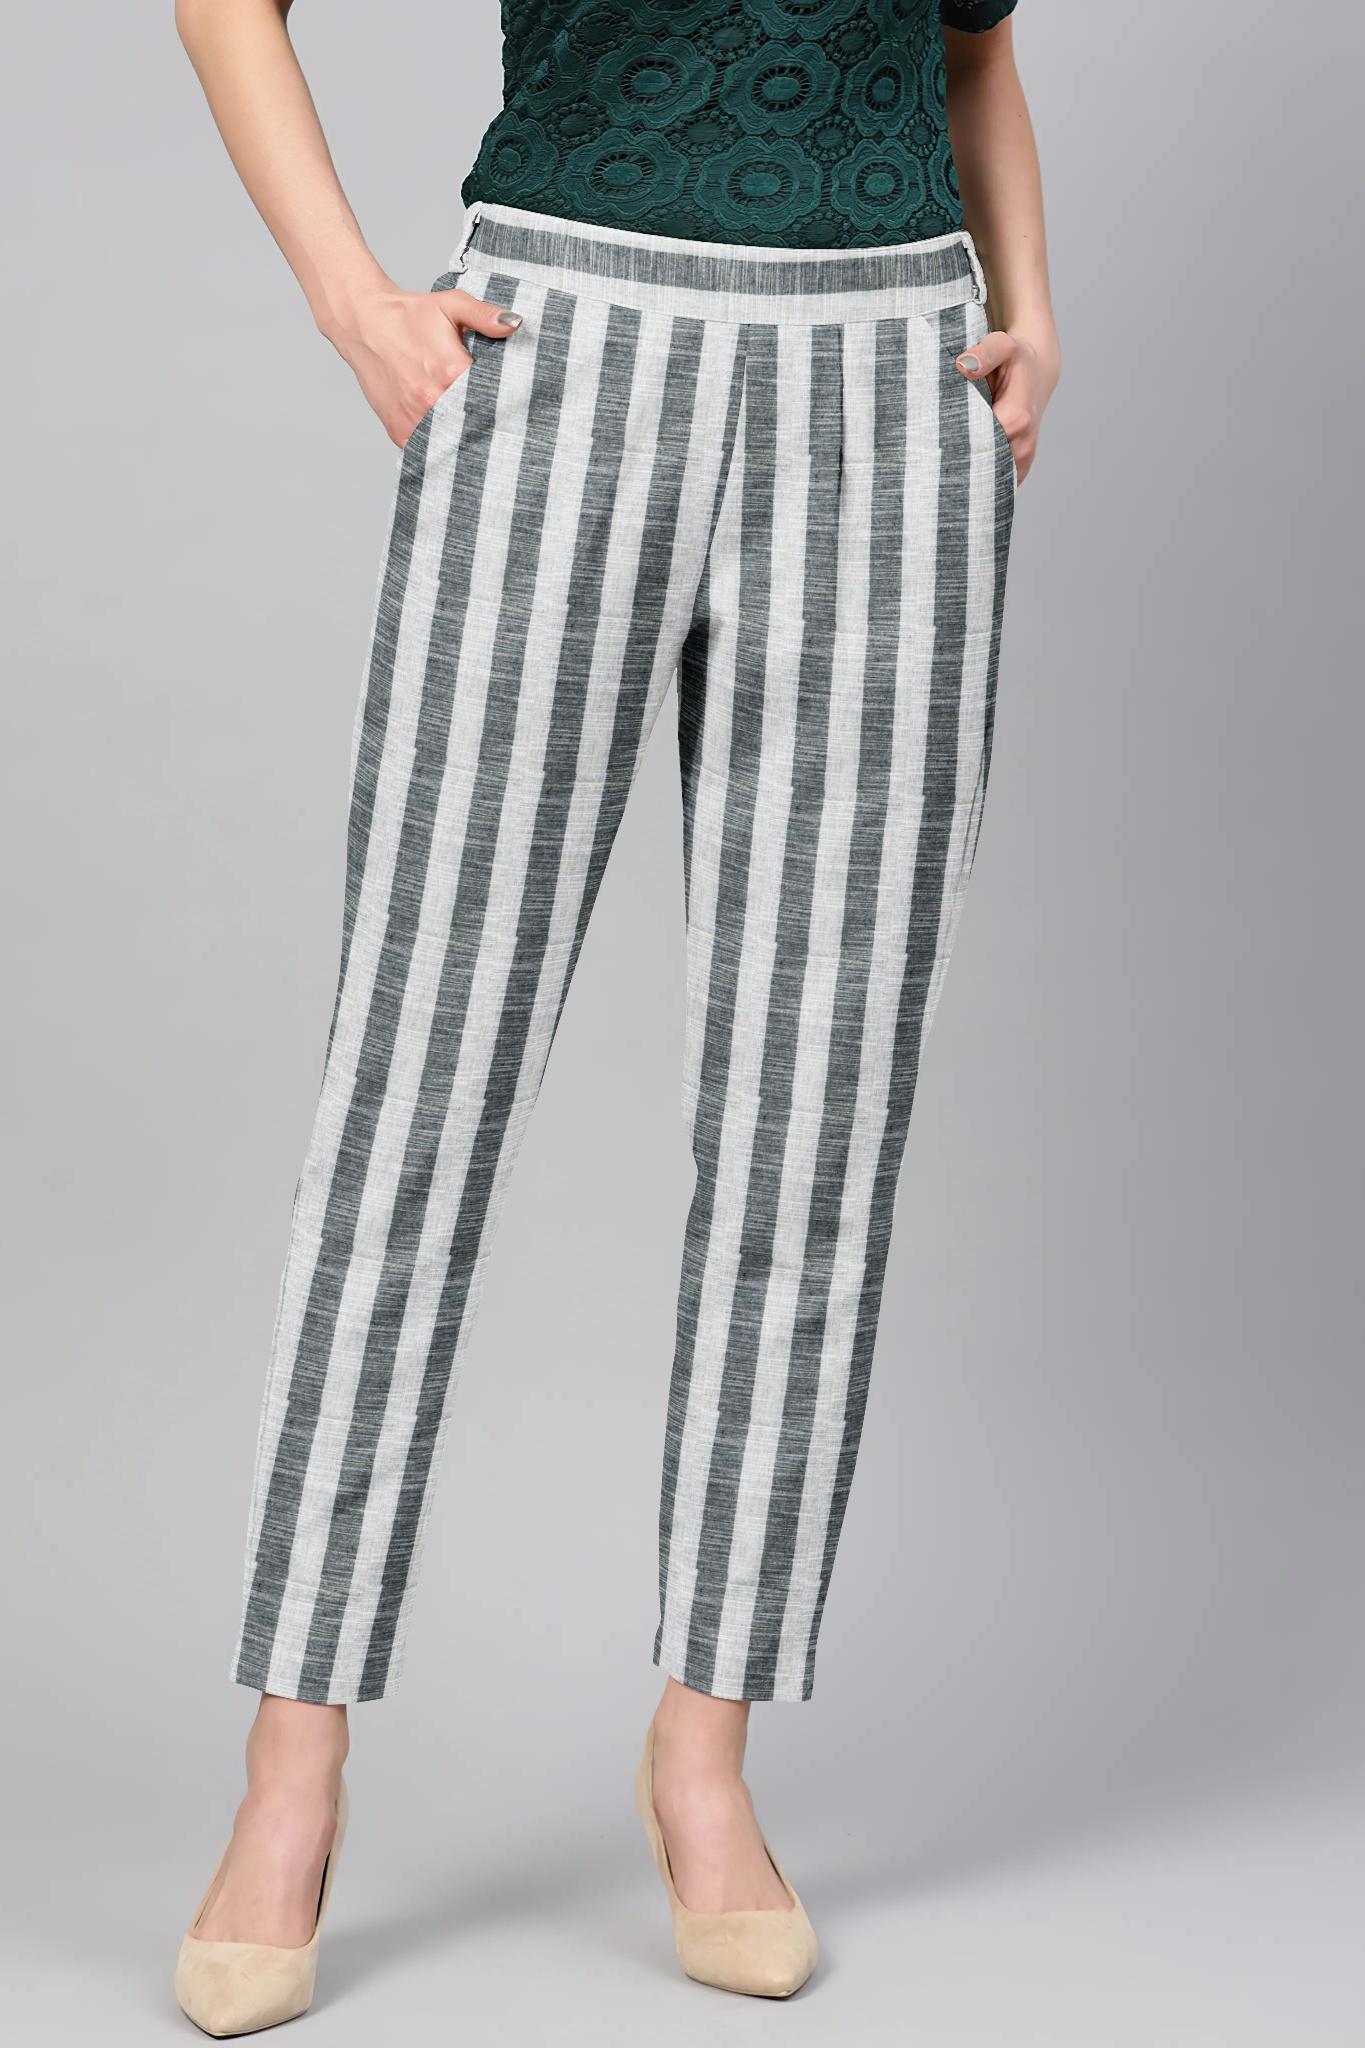 /home/customer/www/fabartcraft.com/public_html/uploadshttps://www.shopolics.com/uploads/images/medium/Gray-White-Cotton-Stripe-Regular-Fit-Solid-Trouser-36104.jpg